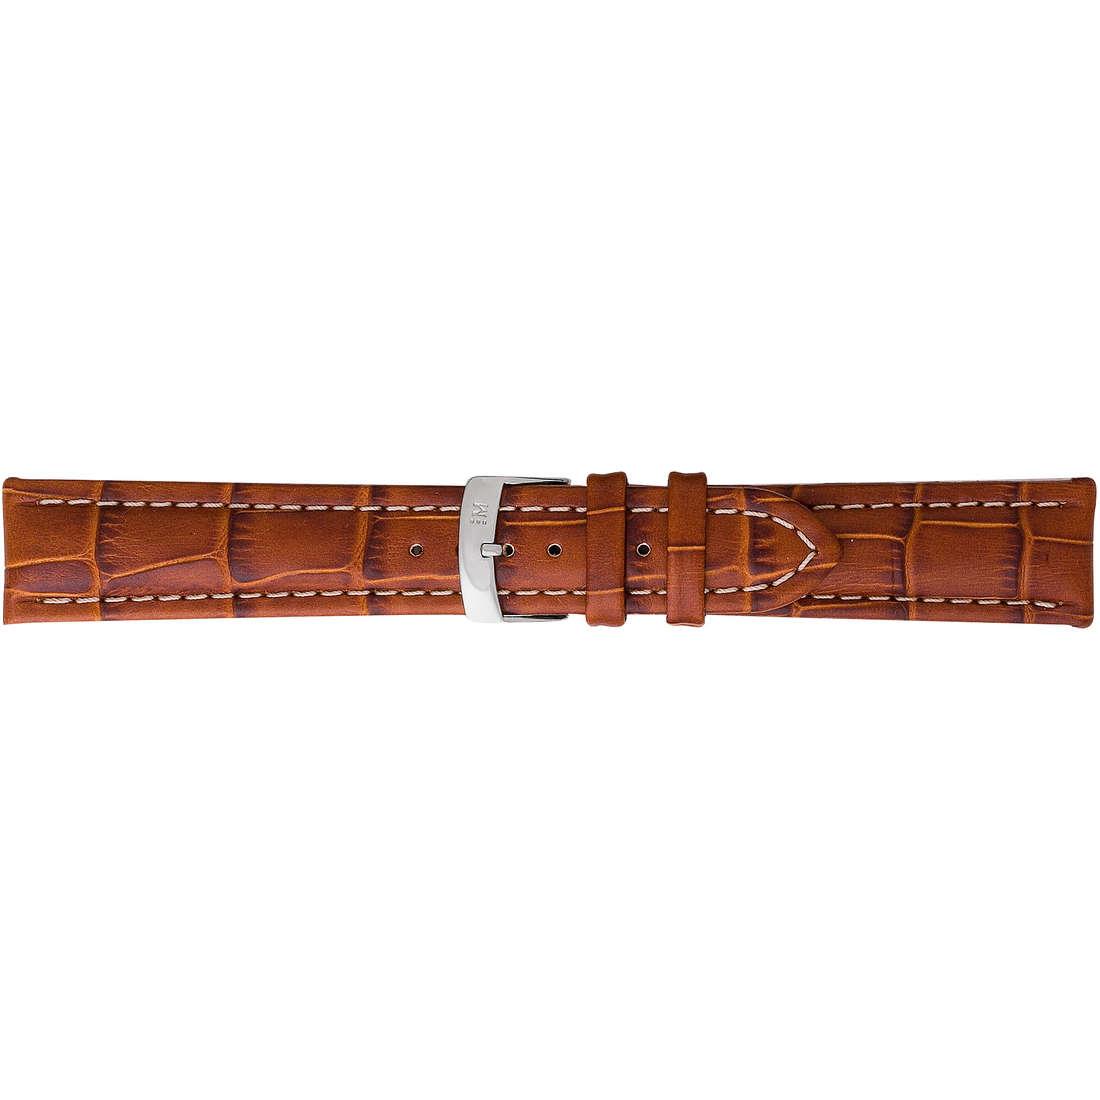 watch watch bands watch straps man Morellato Morellato 1930 A01U3252480041CR18